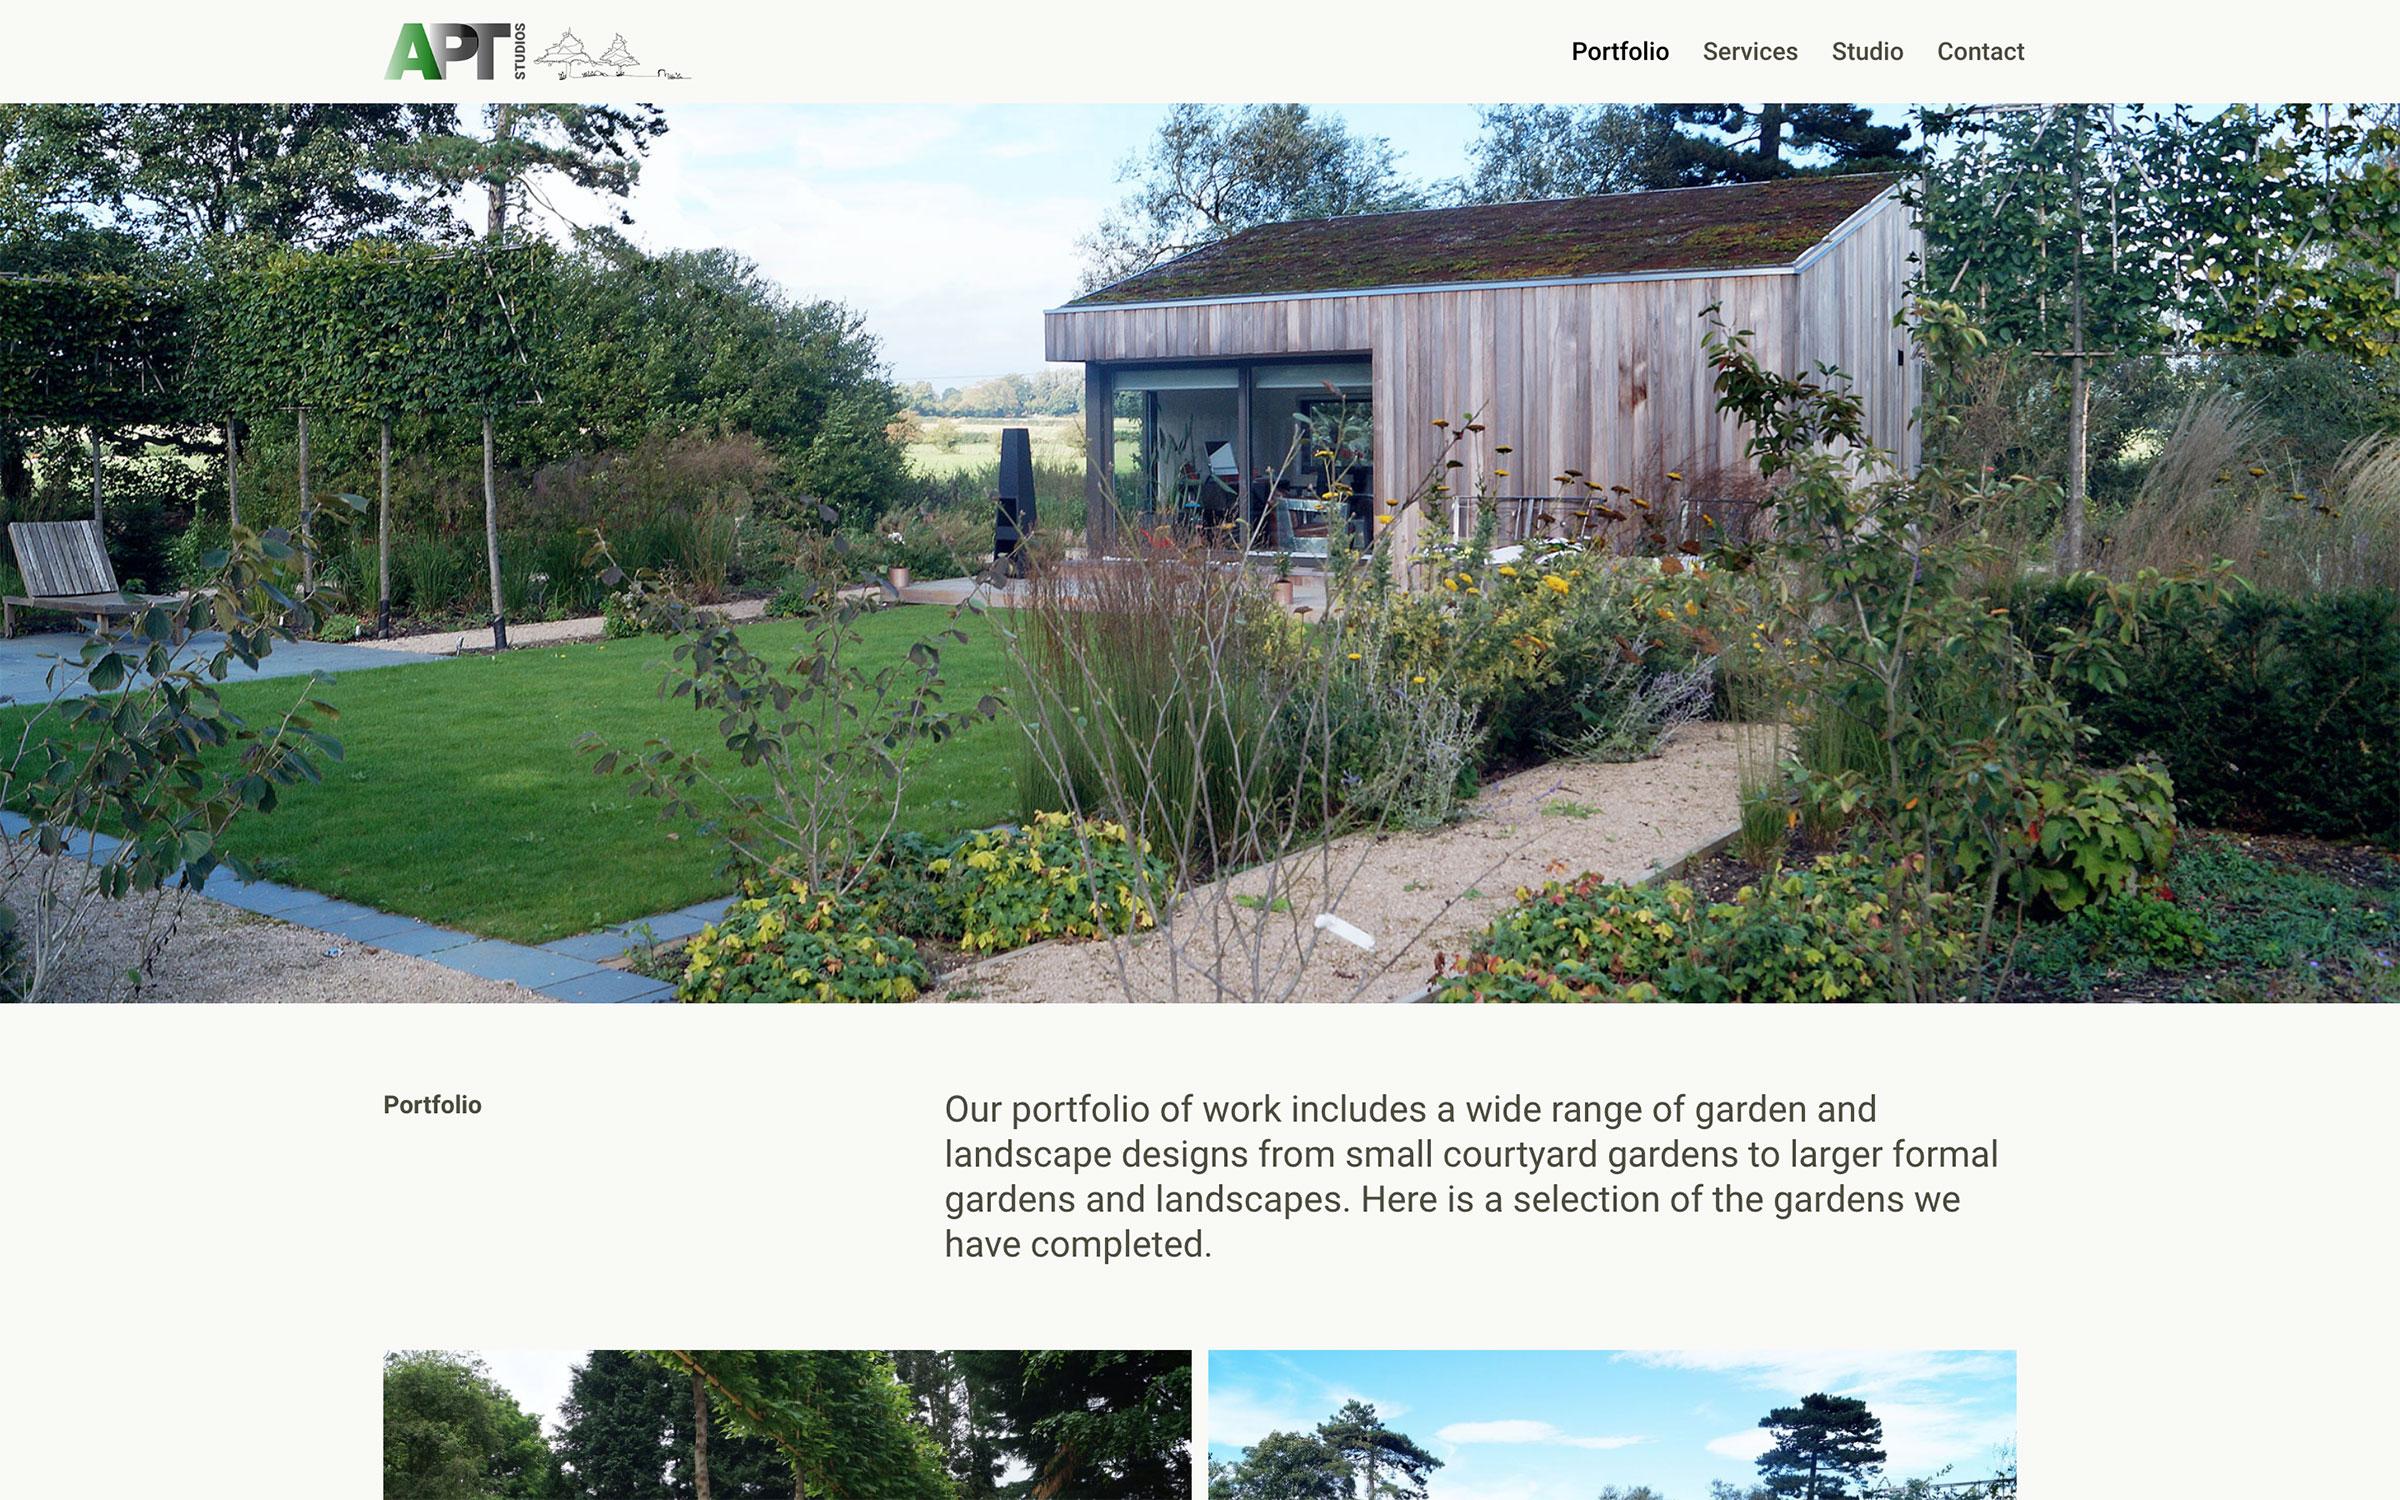 AptStudios.co.uk Website Design: Portfolio Page